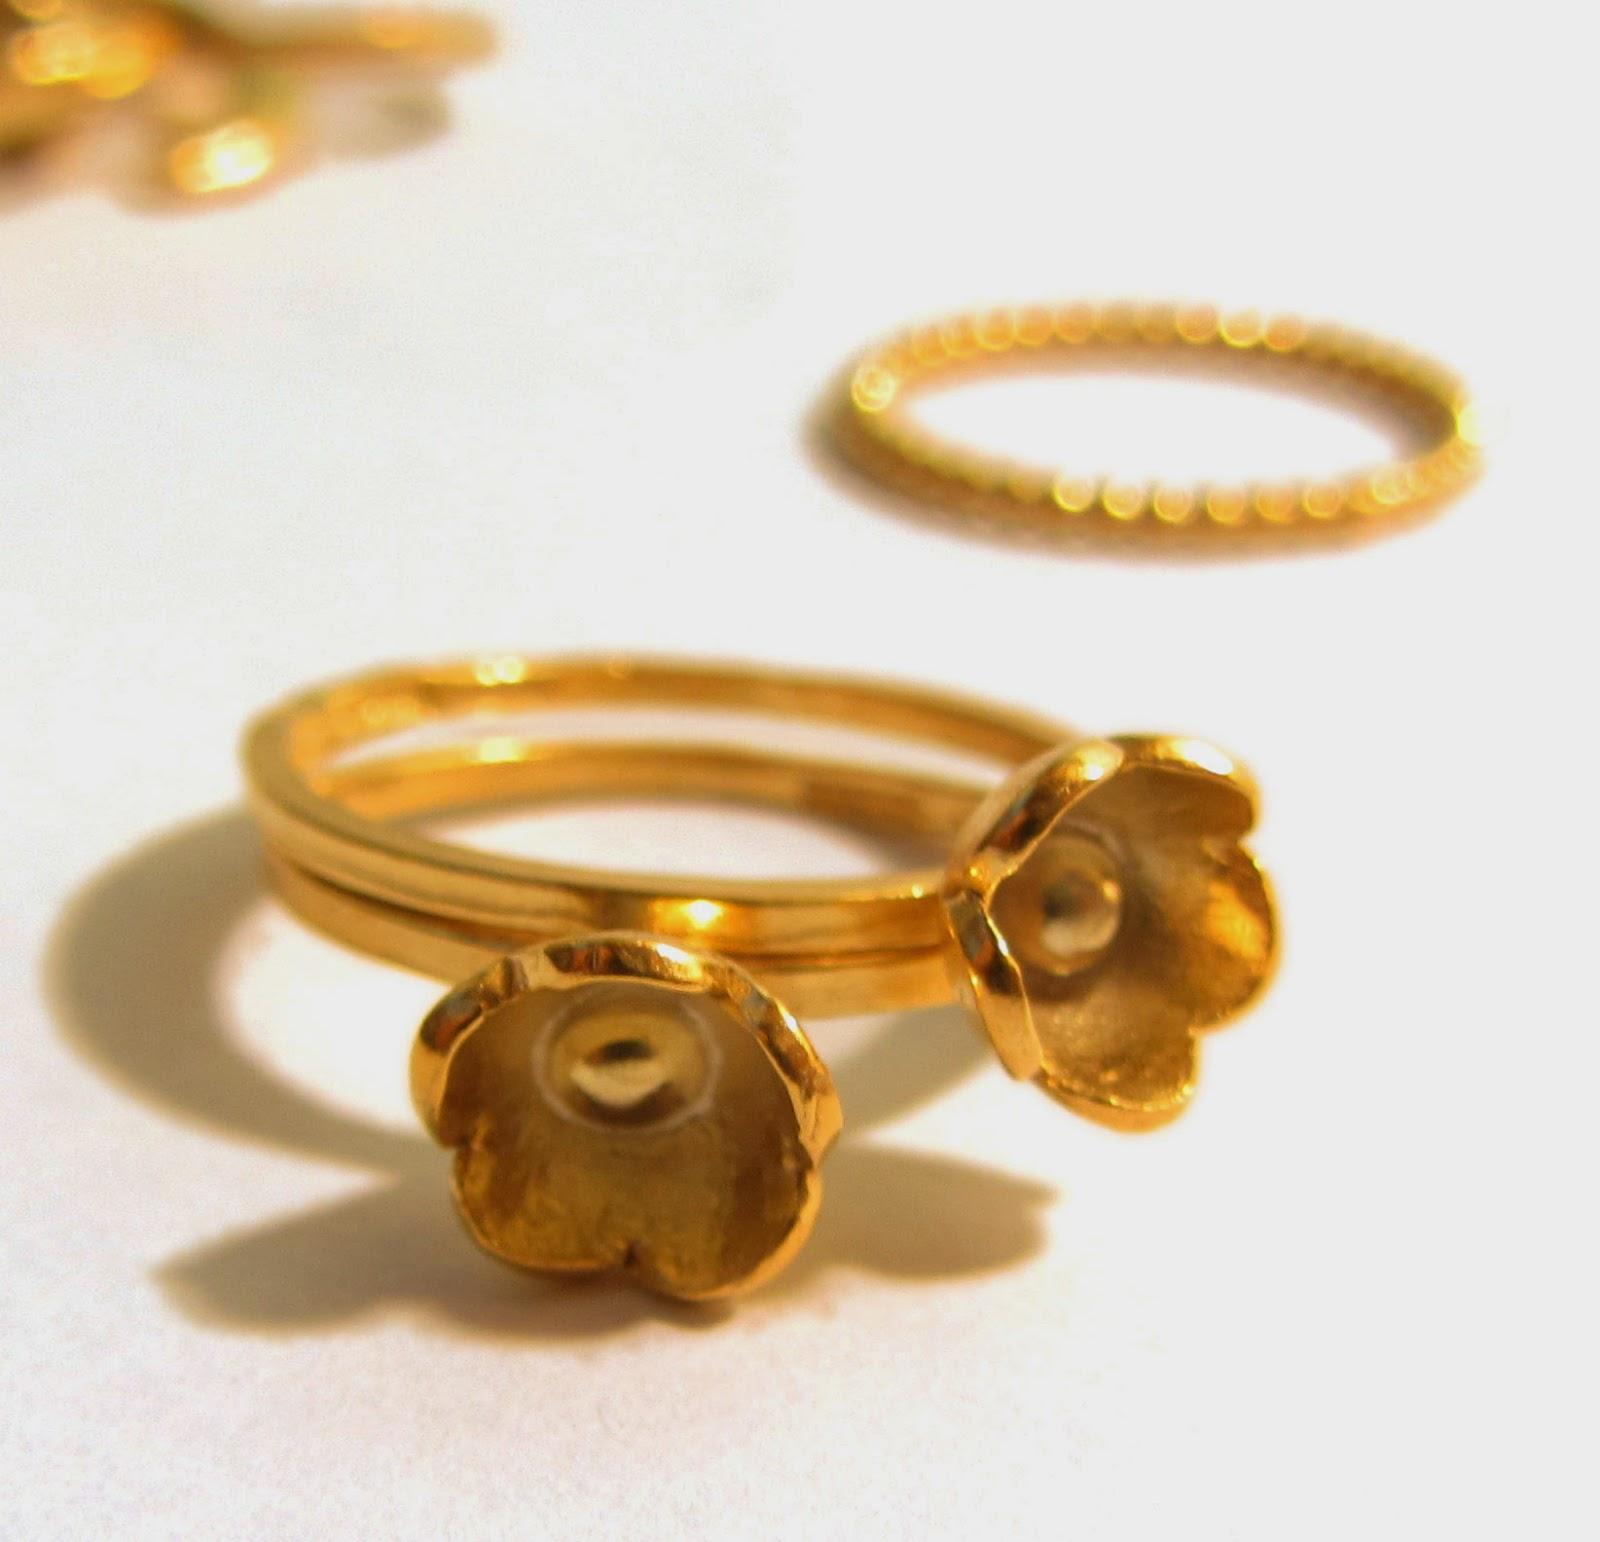 Designer Jewelry to look stunningly beautiful LUXEbyME Designer